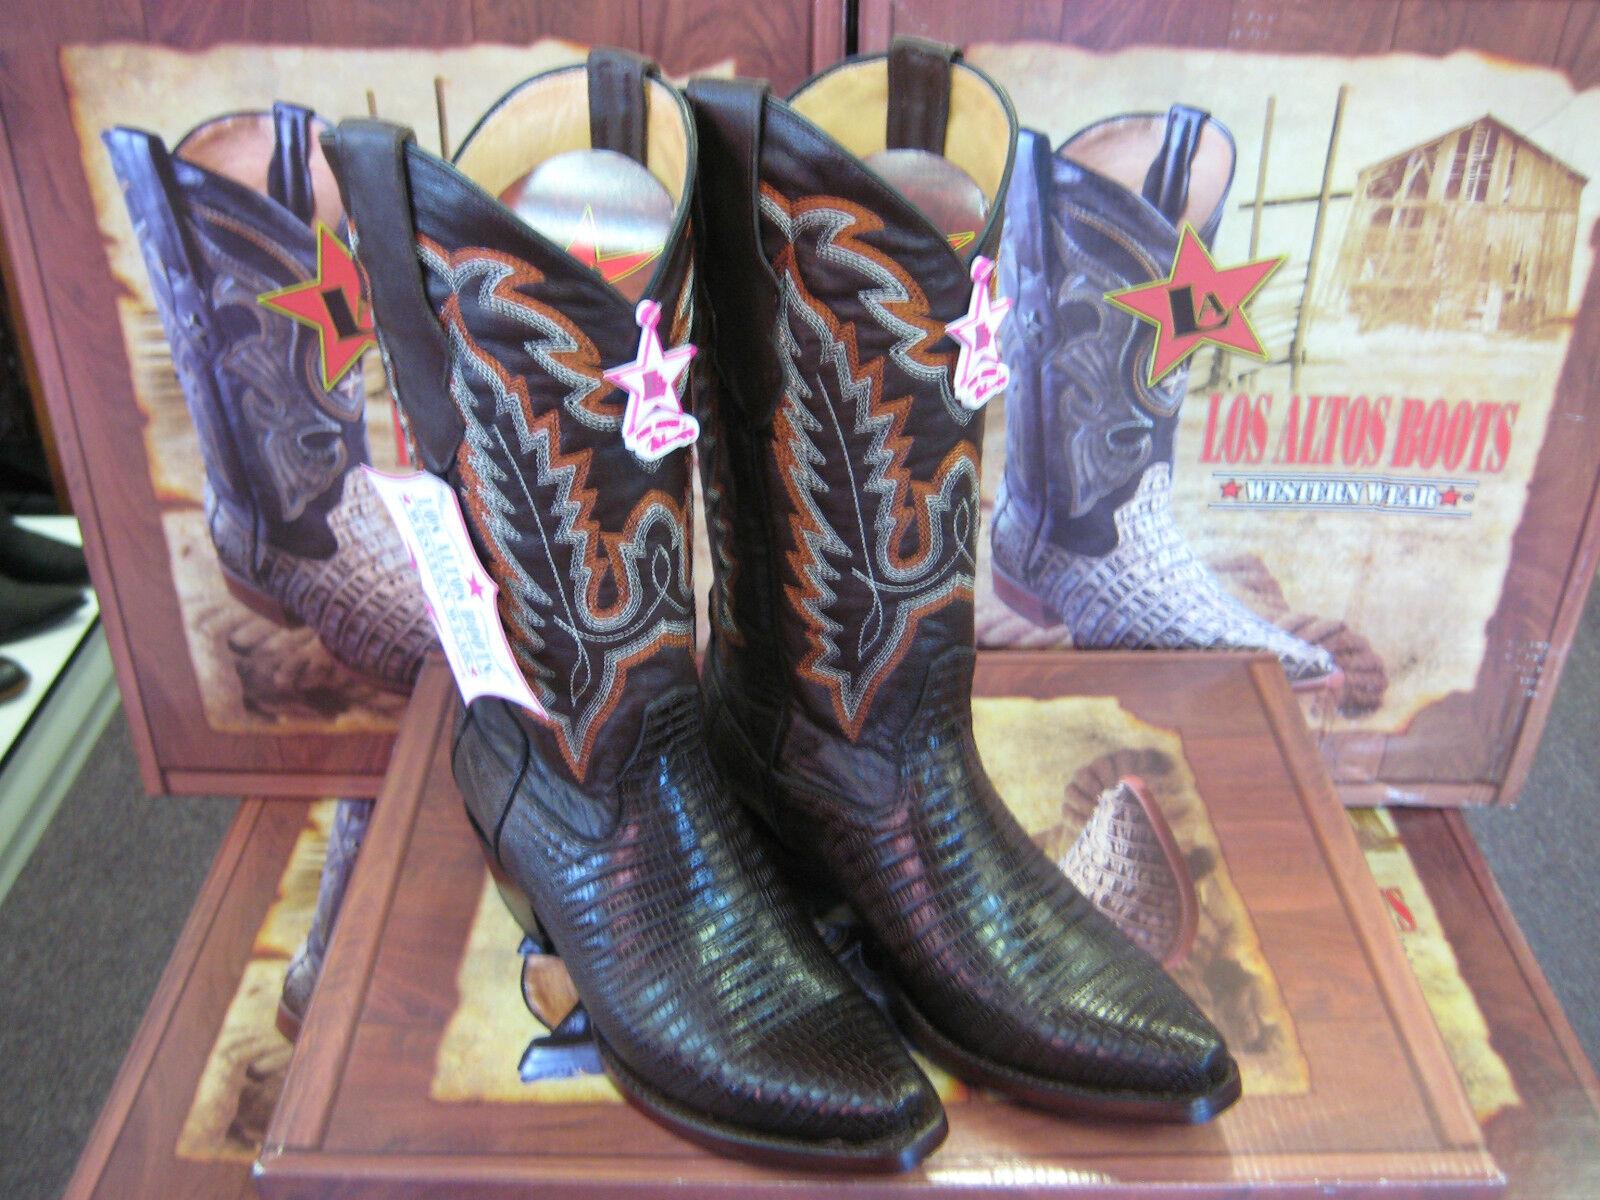 LOS ALTOS WOMEN BROWN GENUINE TEJU LIZARD SNIP TOE WESTERN WESTERN WESTERN COWBOY BOOT 340707 763364